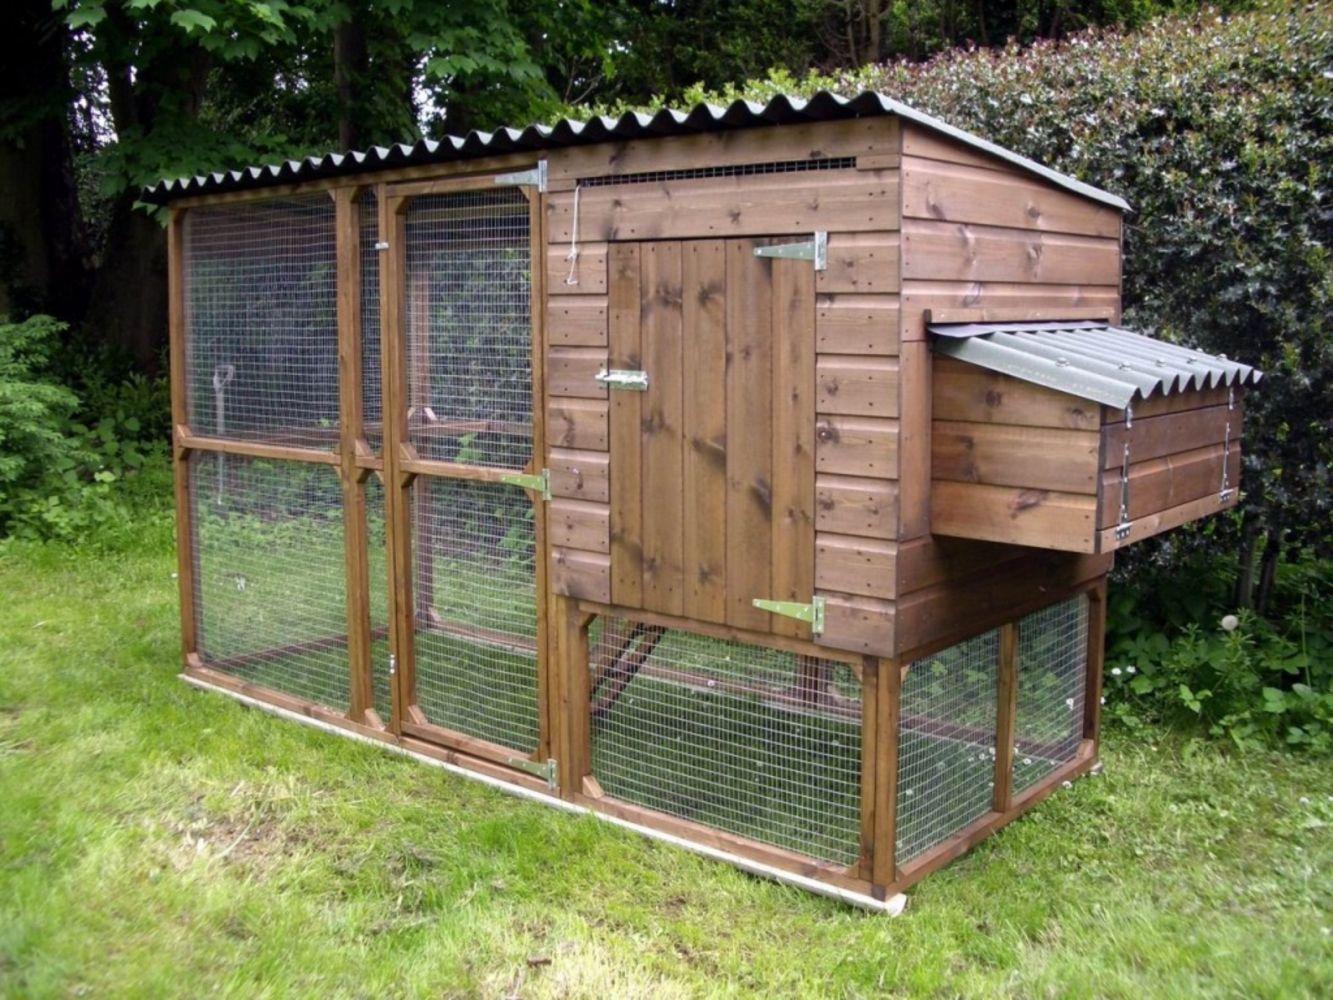 43 Best DIY Ideas for Chicken Coop for Your Backyard   Coops, DIY ...